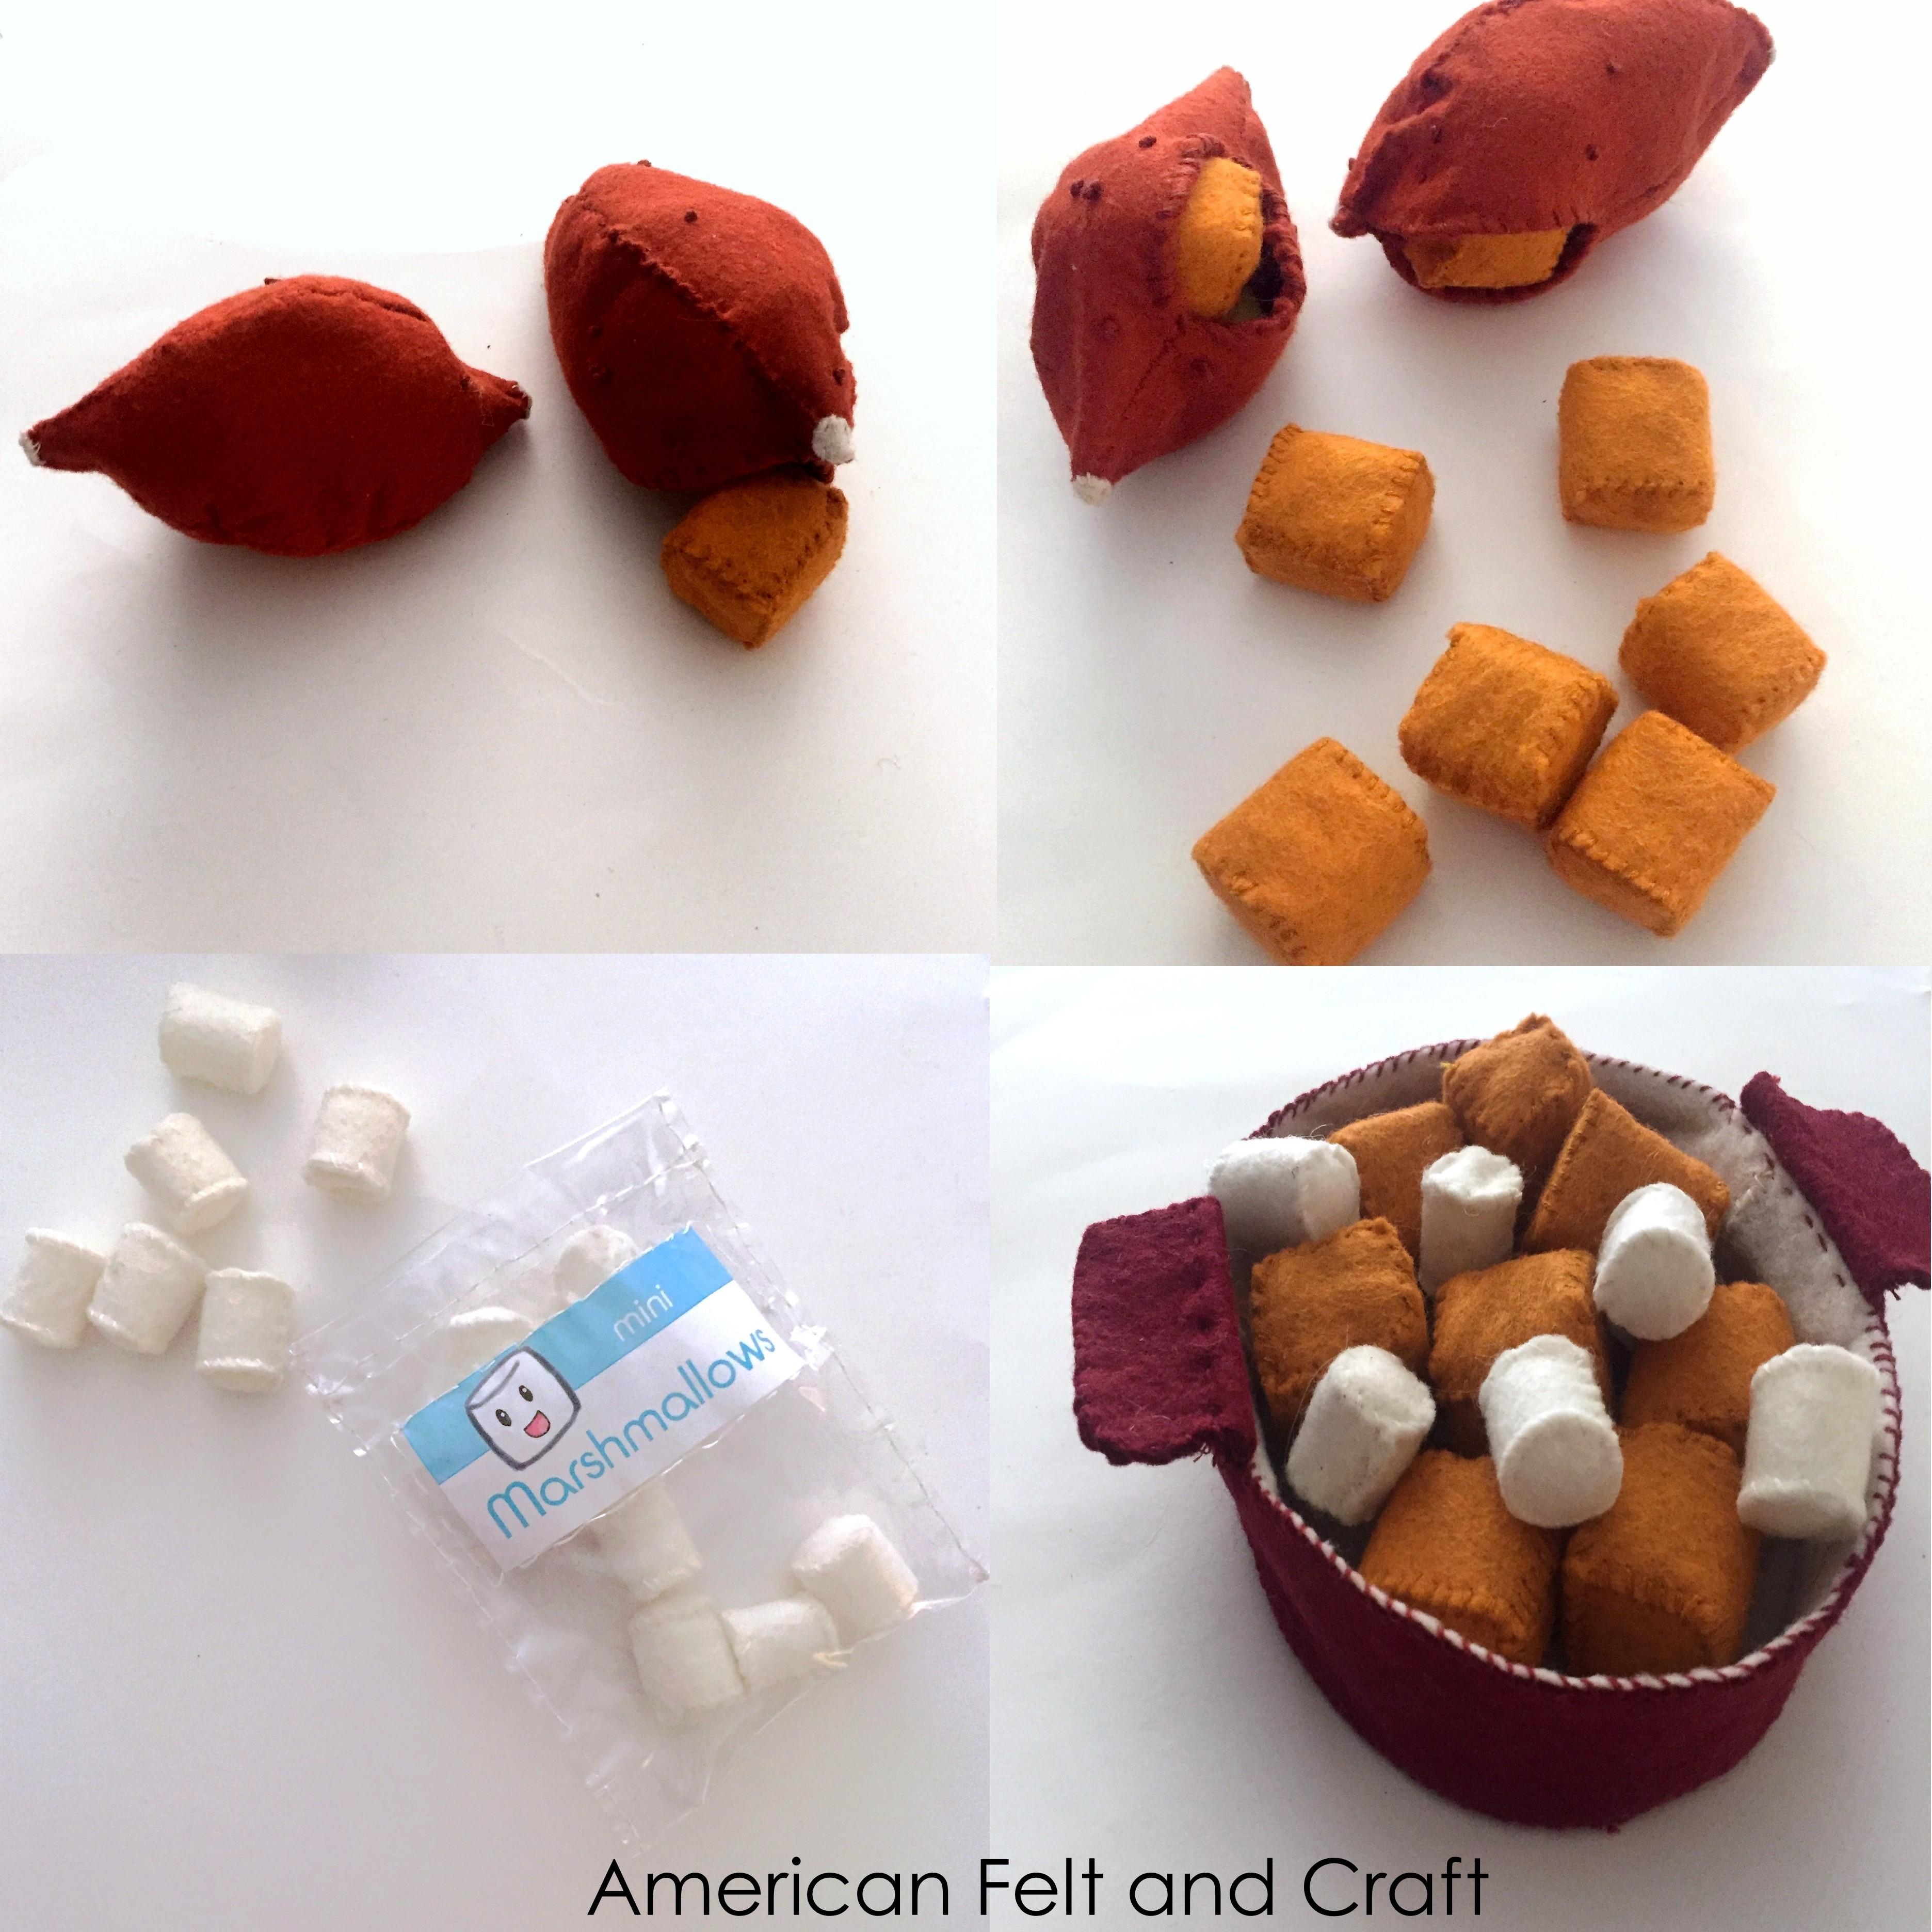 Felt food candied yams sweet potatoes American felt and Craft Mini marshmallows